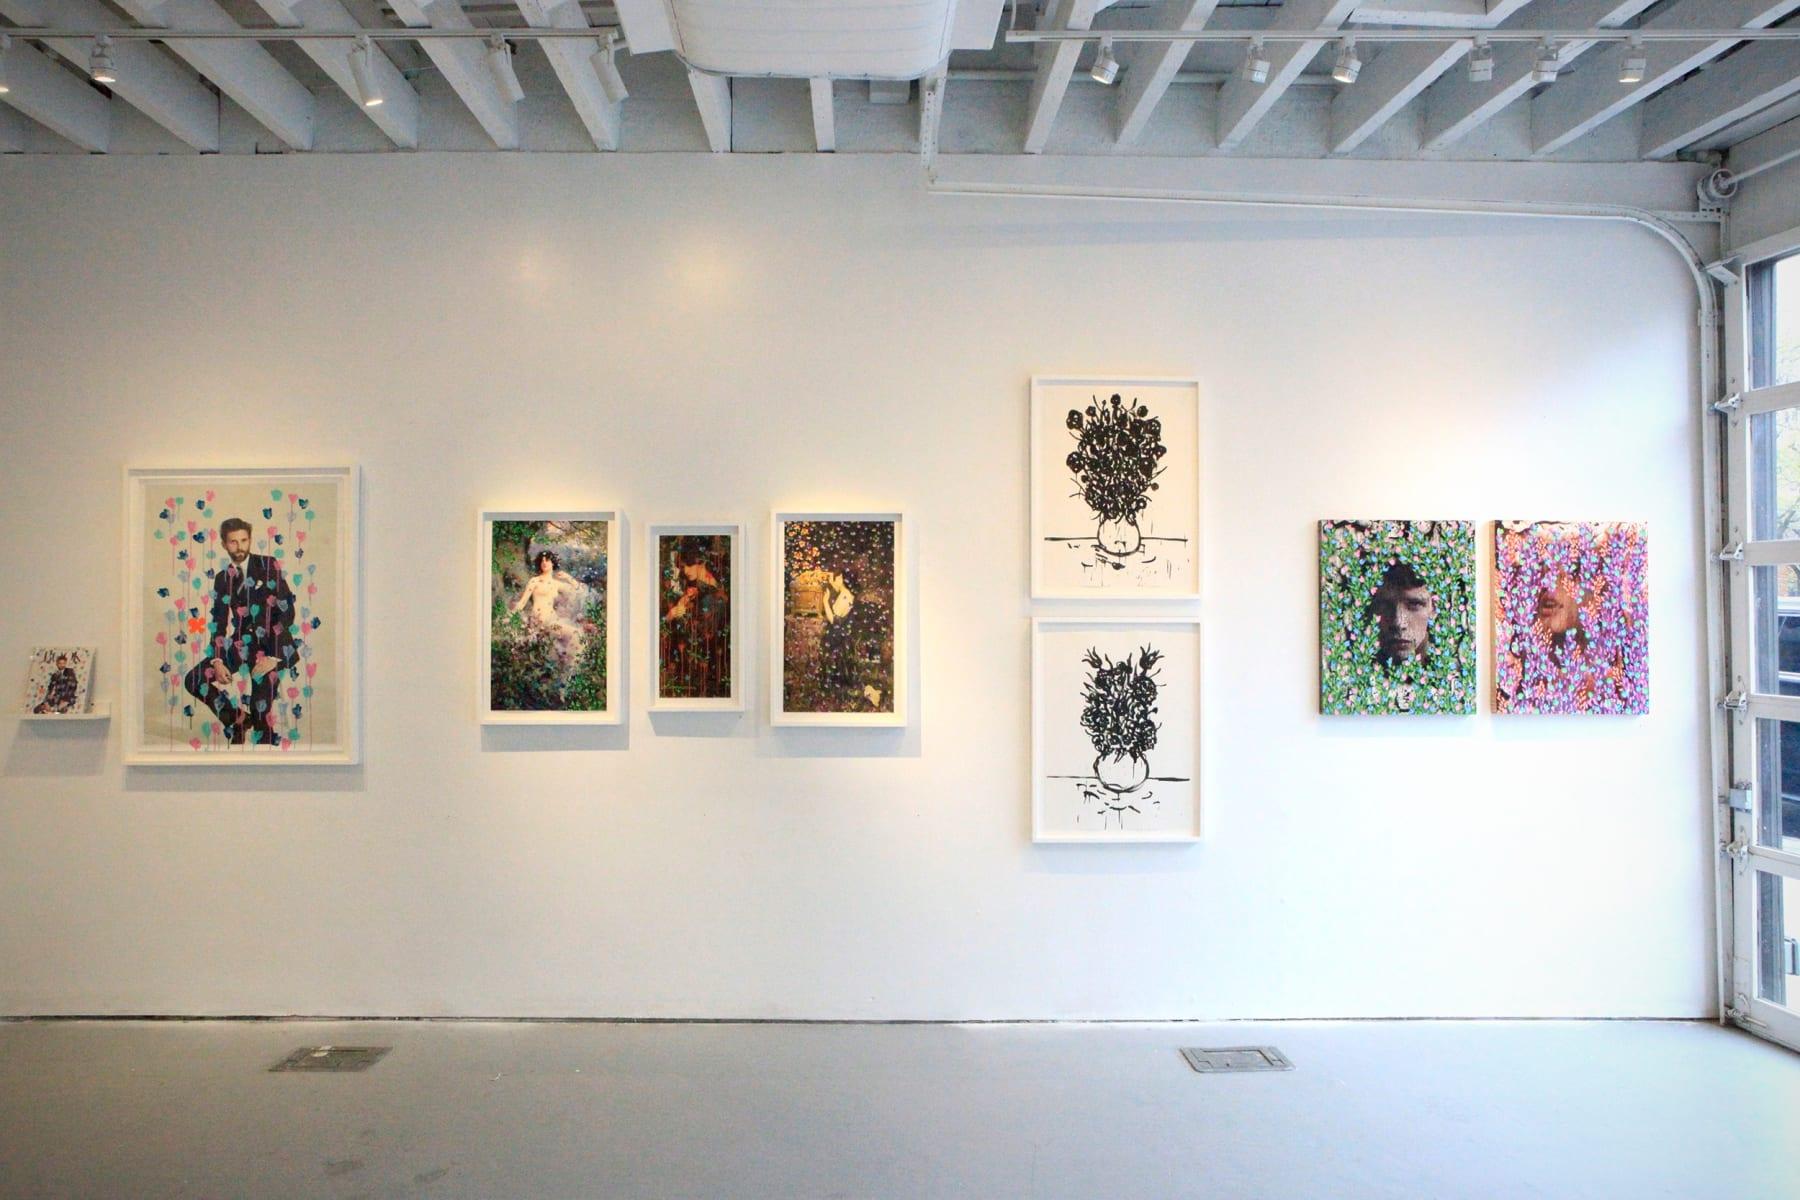 Michael De Feo Flowers Pop-Up 198 Allen Street, New York, New York Installation view.